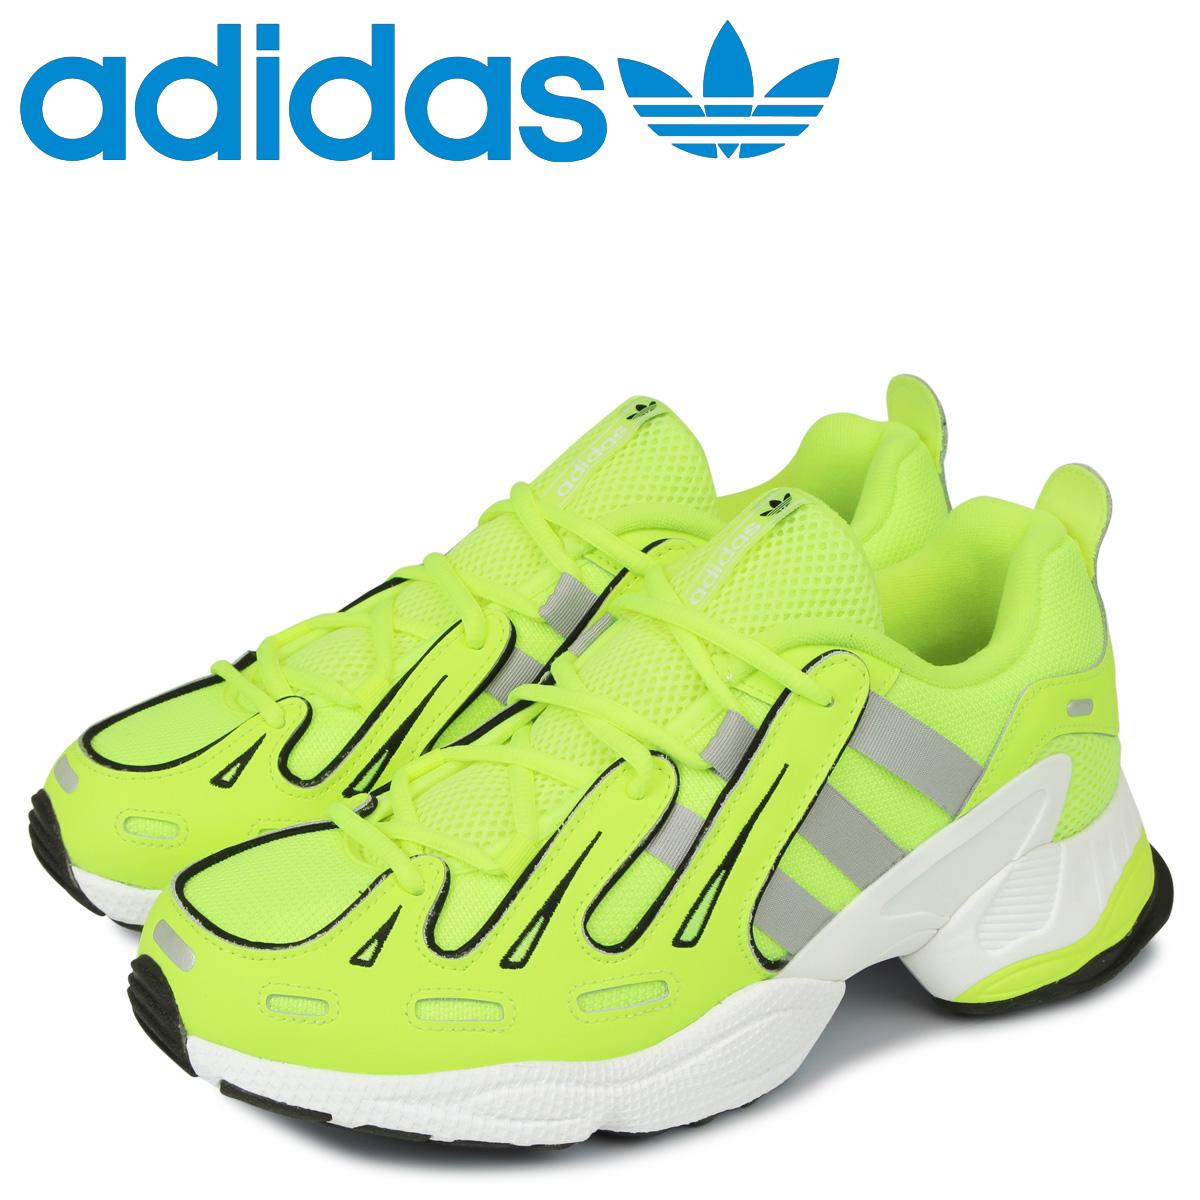 adidas Originals アディダス オリジナルス ガゼル スニーカー メンズ ガッツレー EQT GAZELLE イエロー EE4773